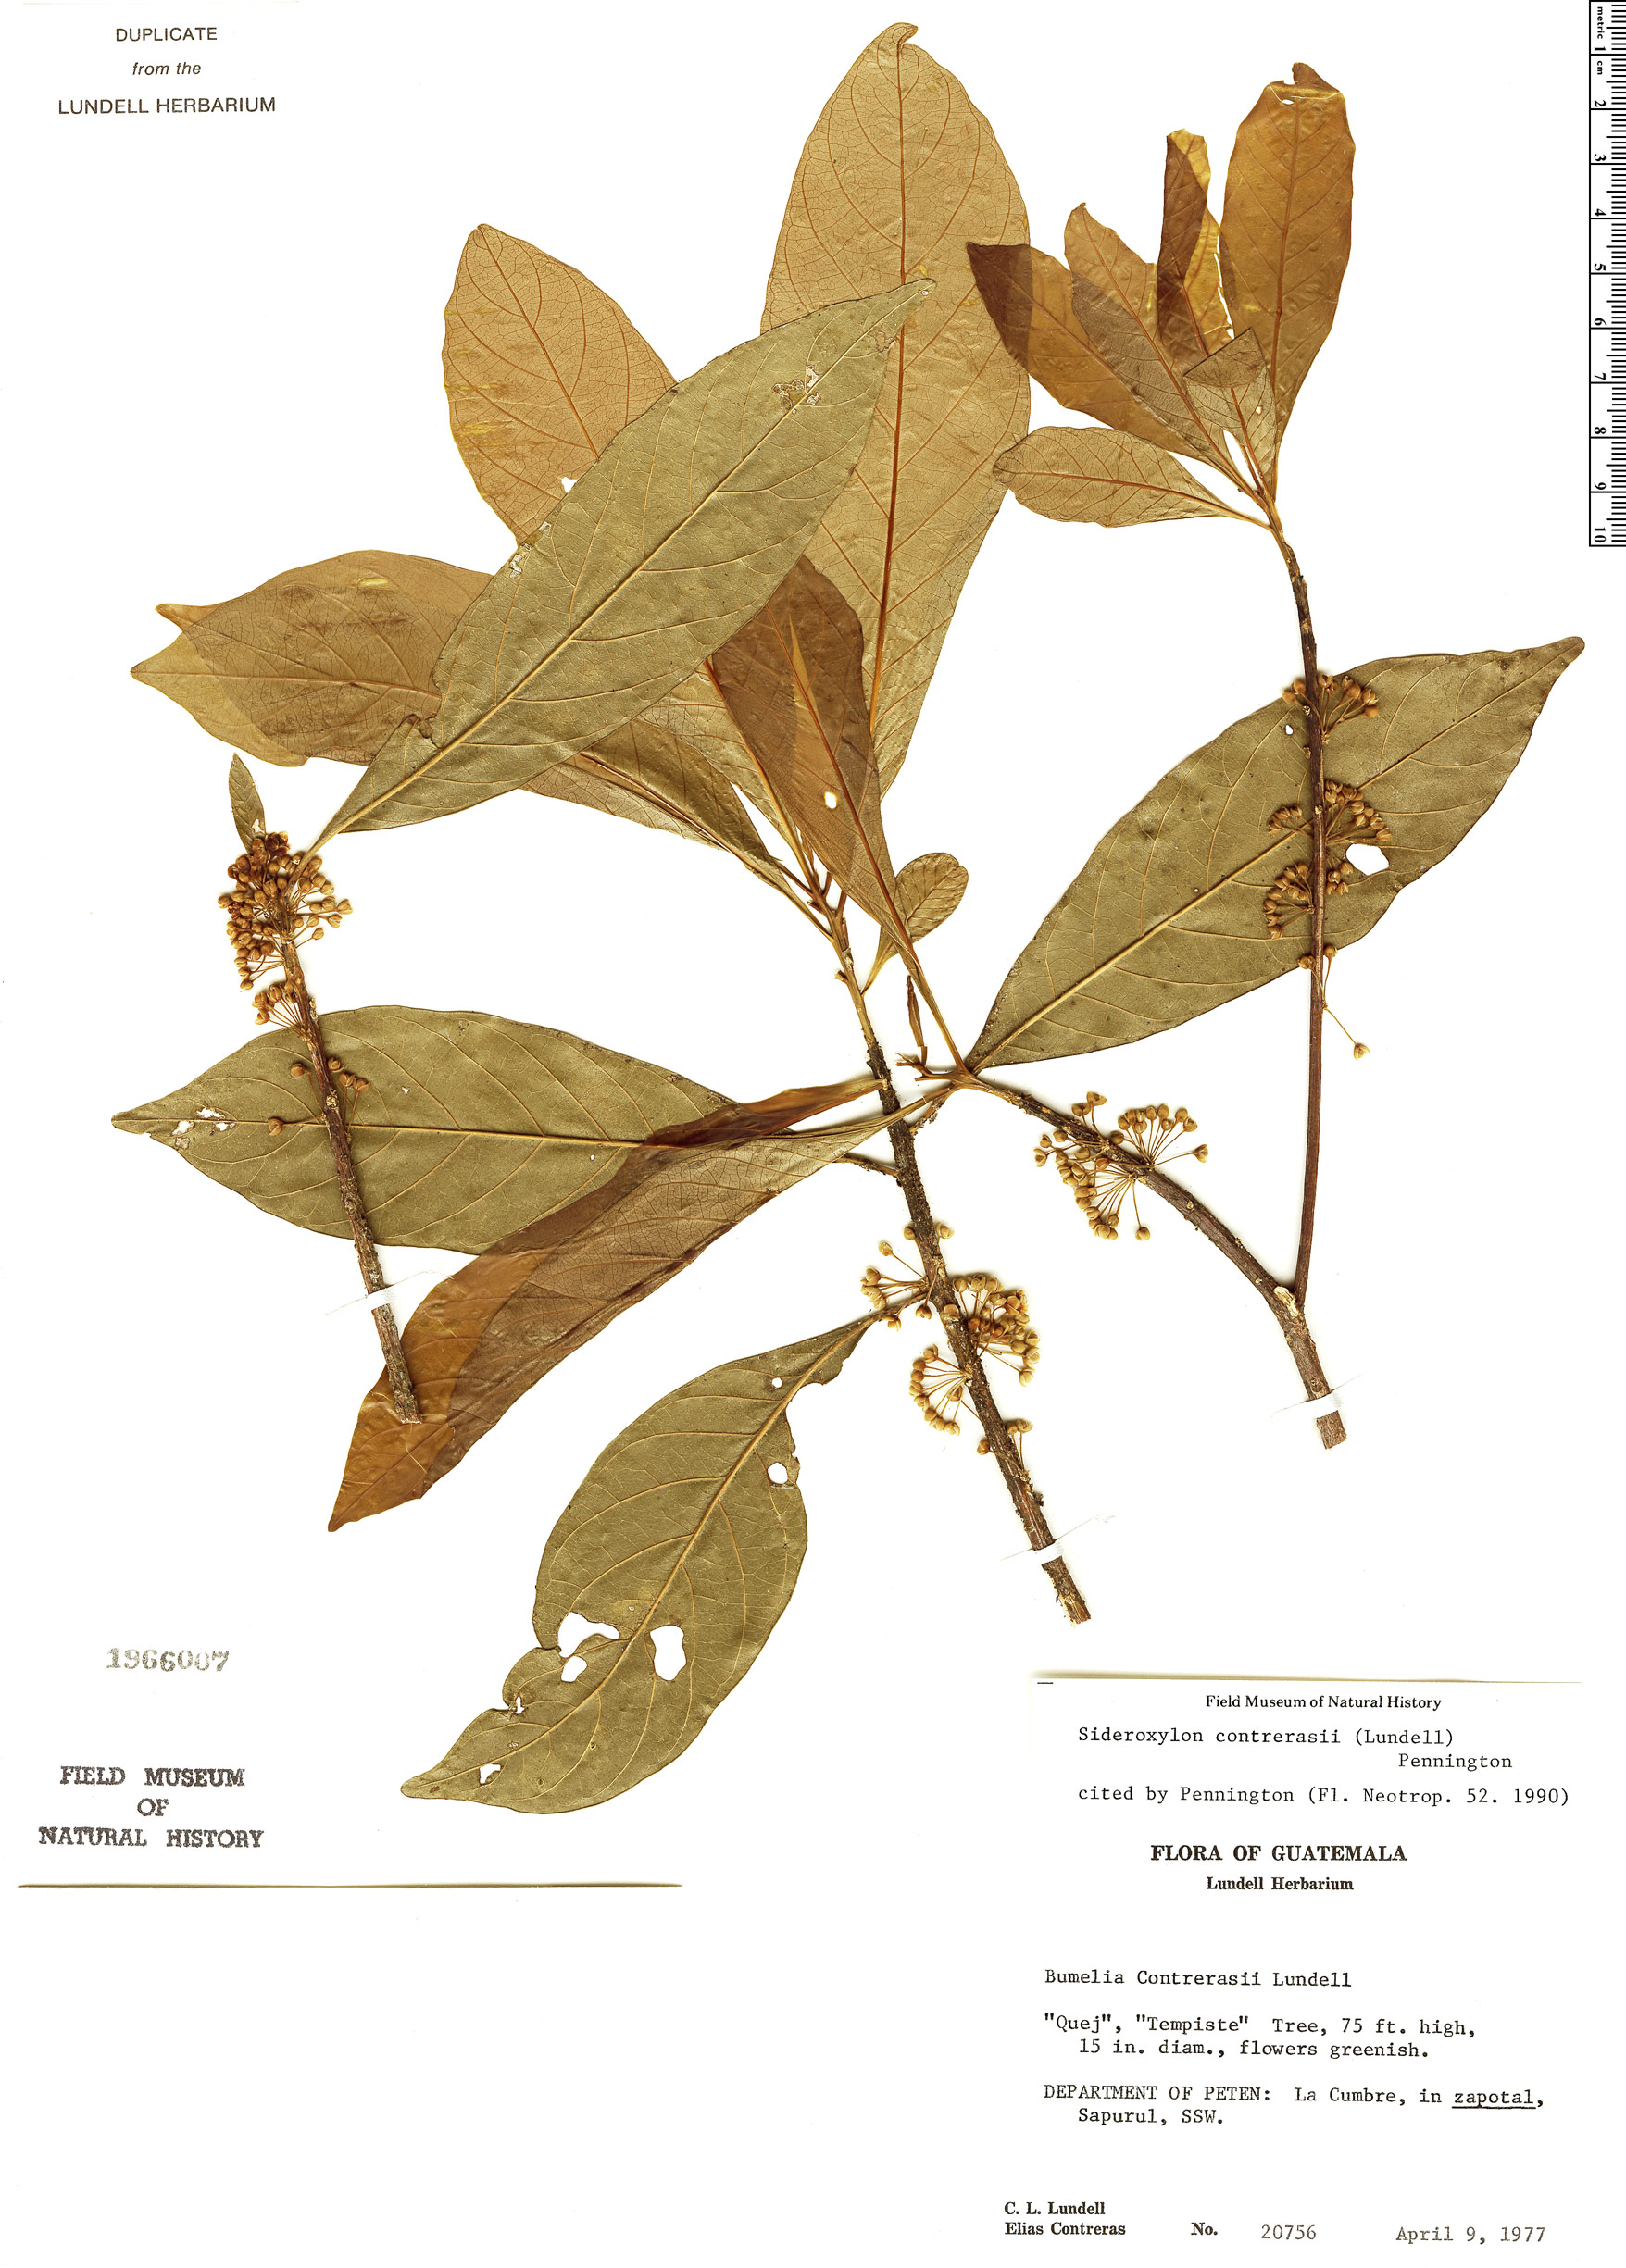 Specimen: Sideroxylon contrerasii